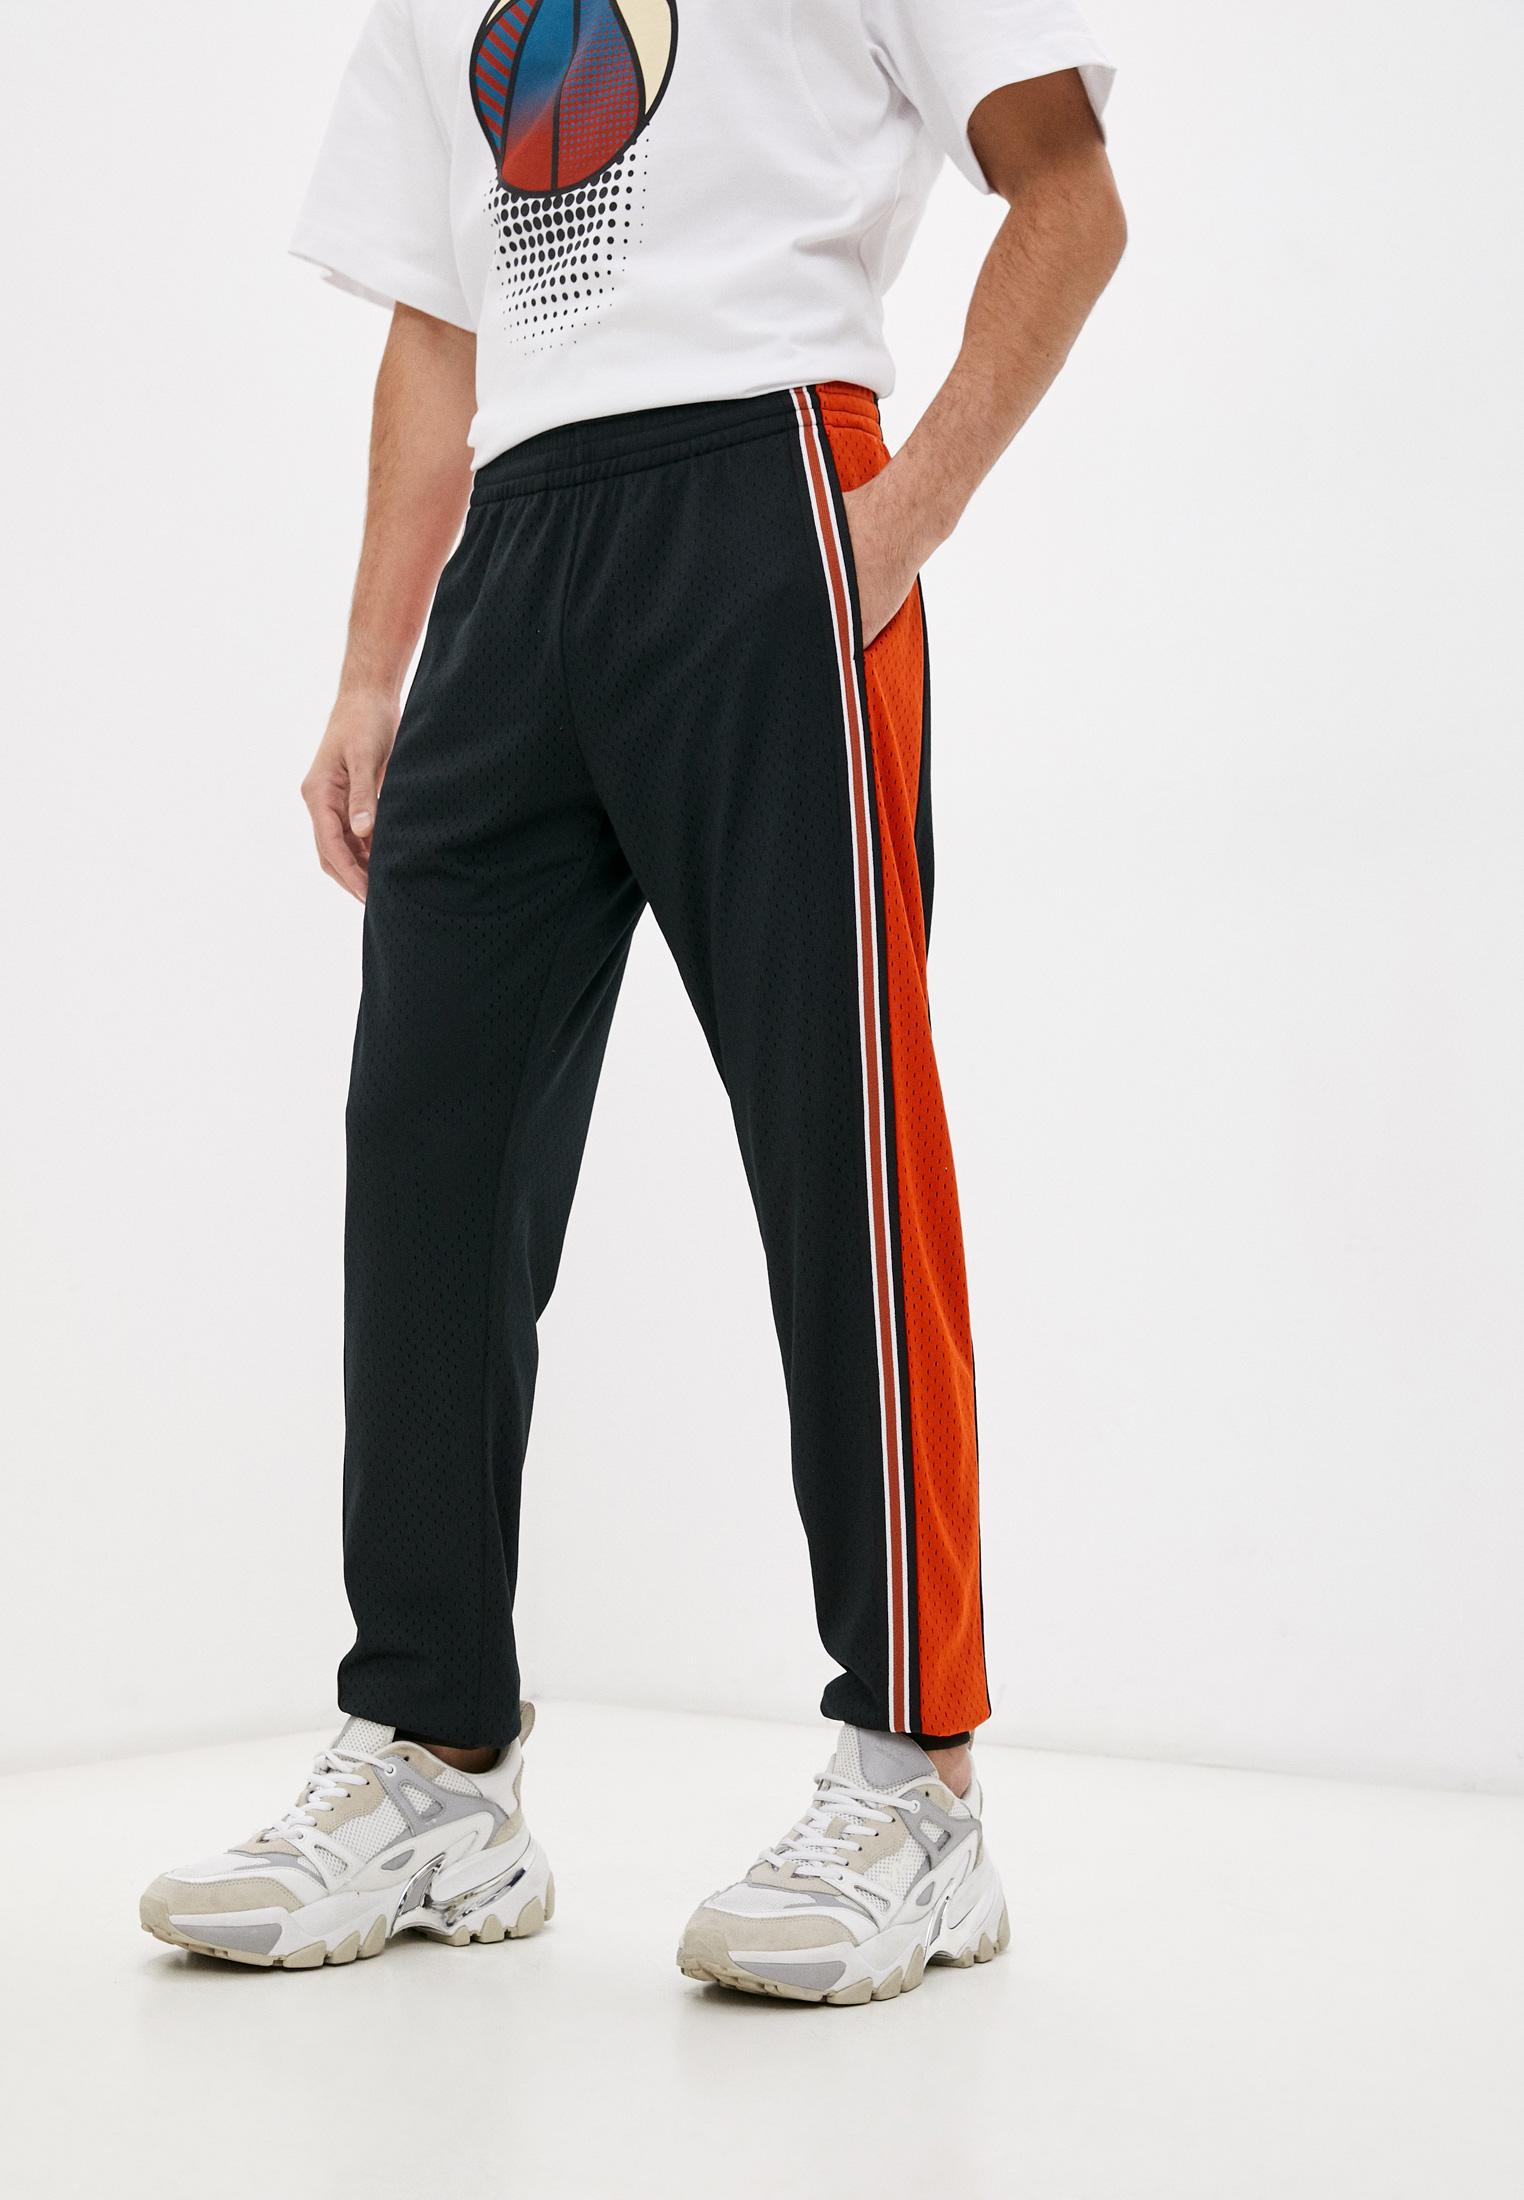 Мужские спортивные брюки Bikkembergs (Биккембергс) C 1 157 00 M 4224